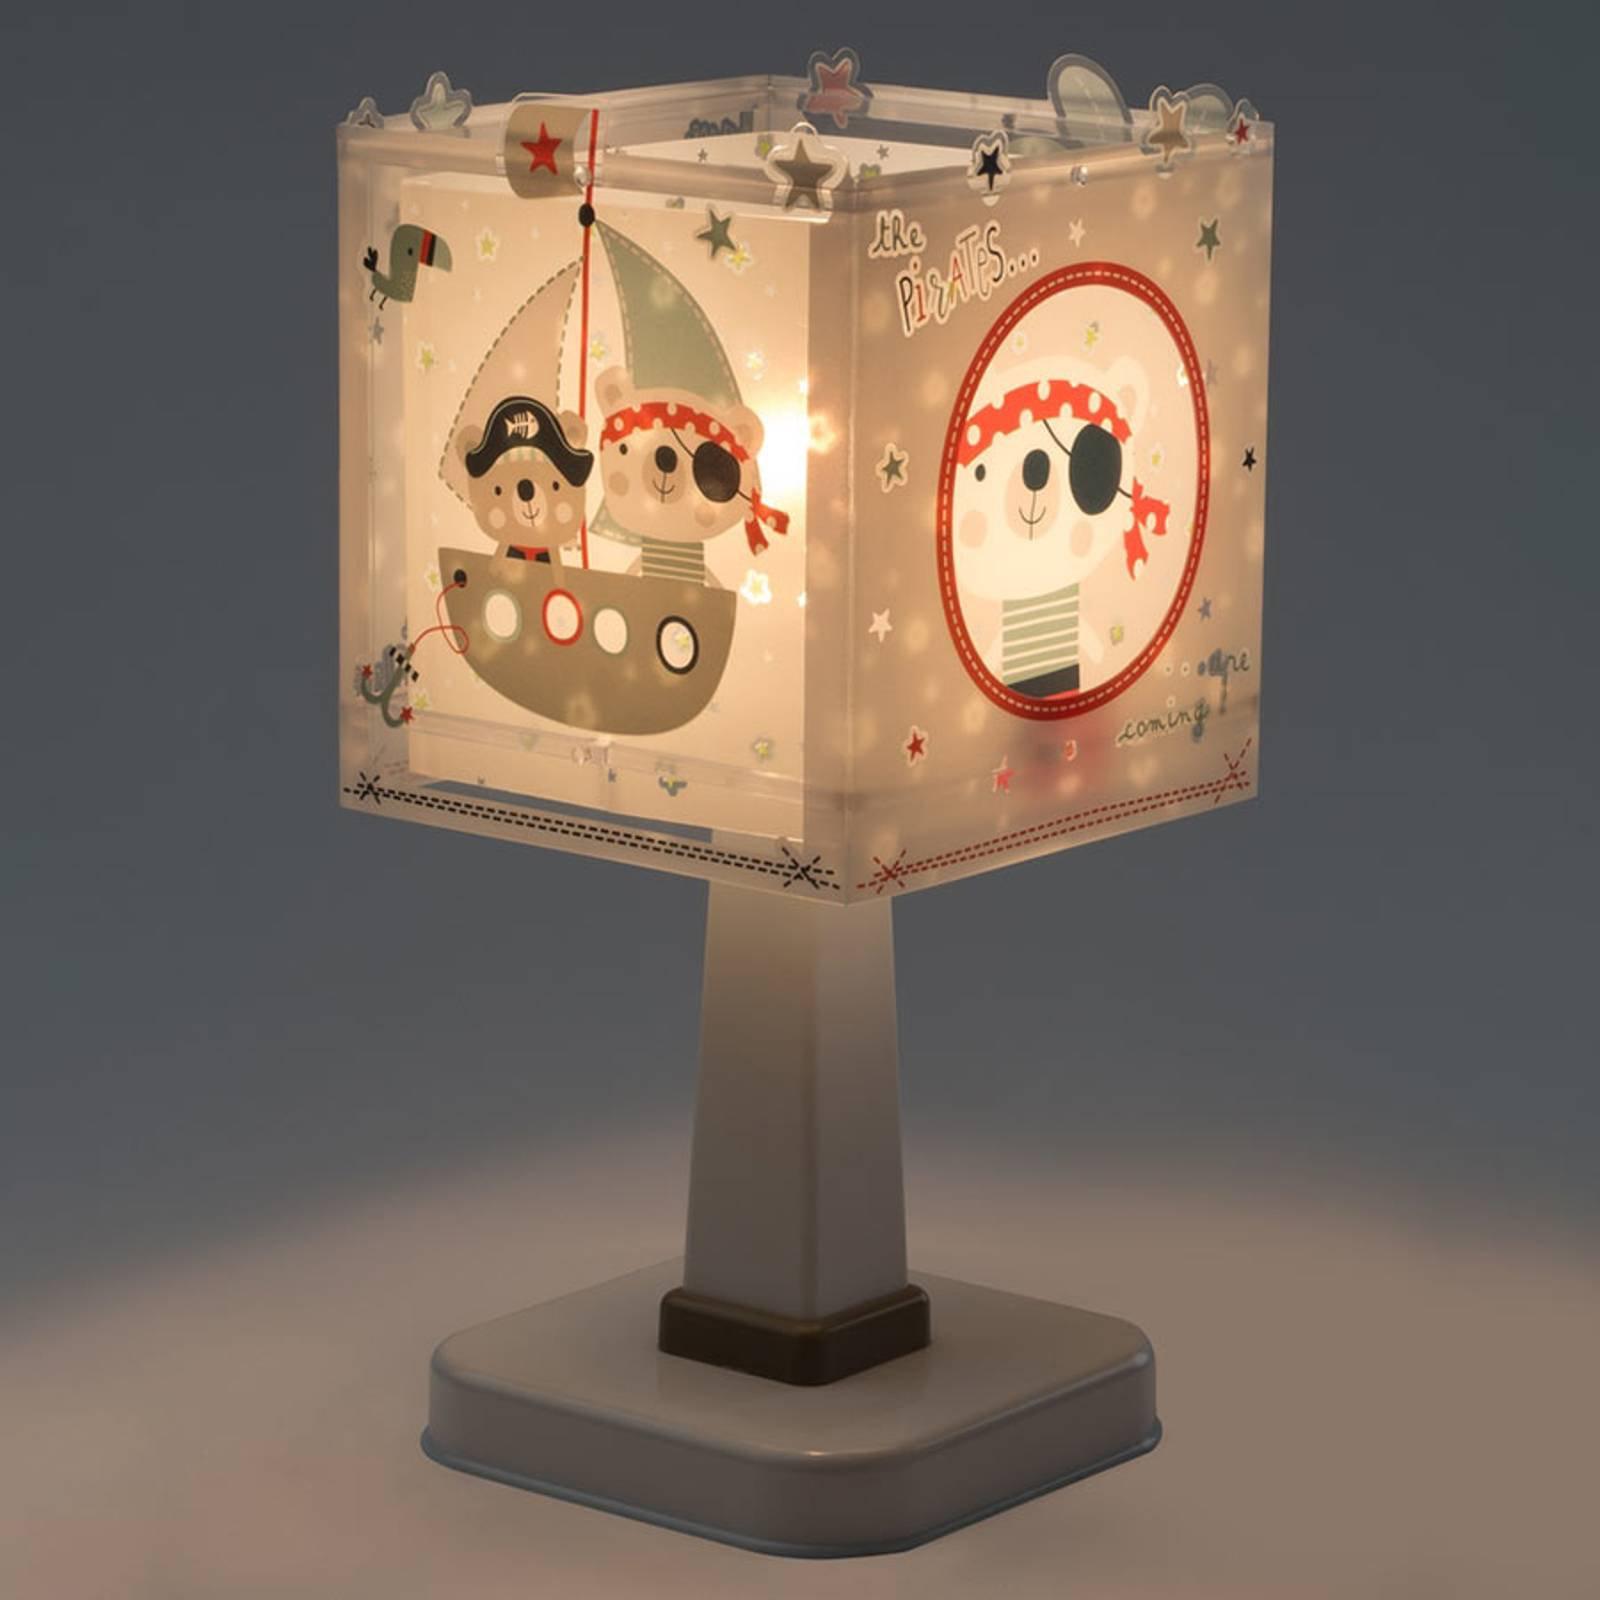 Pirates - kantet bordlampe til barnerommet